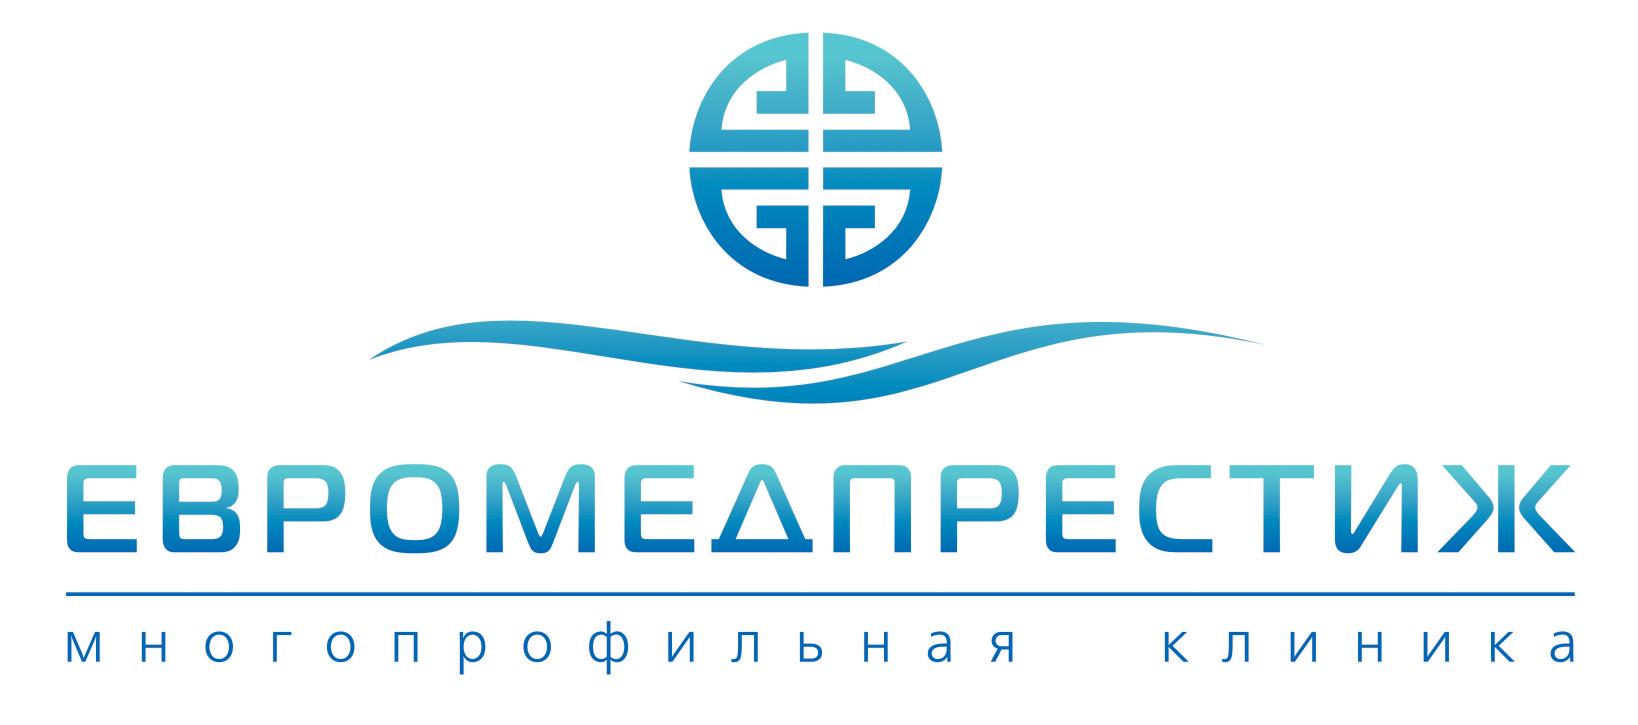 Медицинский центр «Евромедпрестиж»